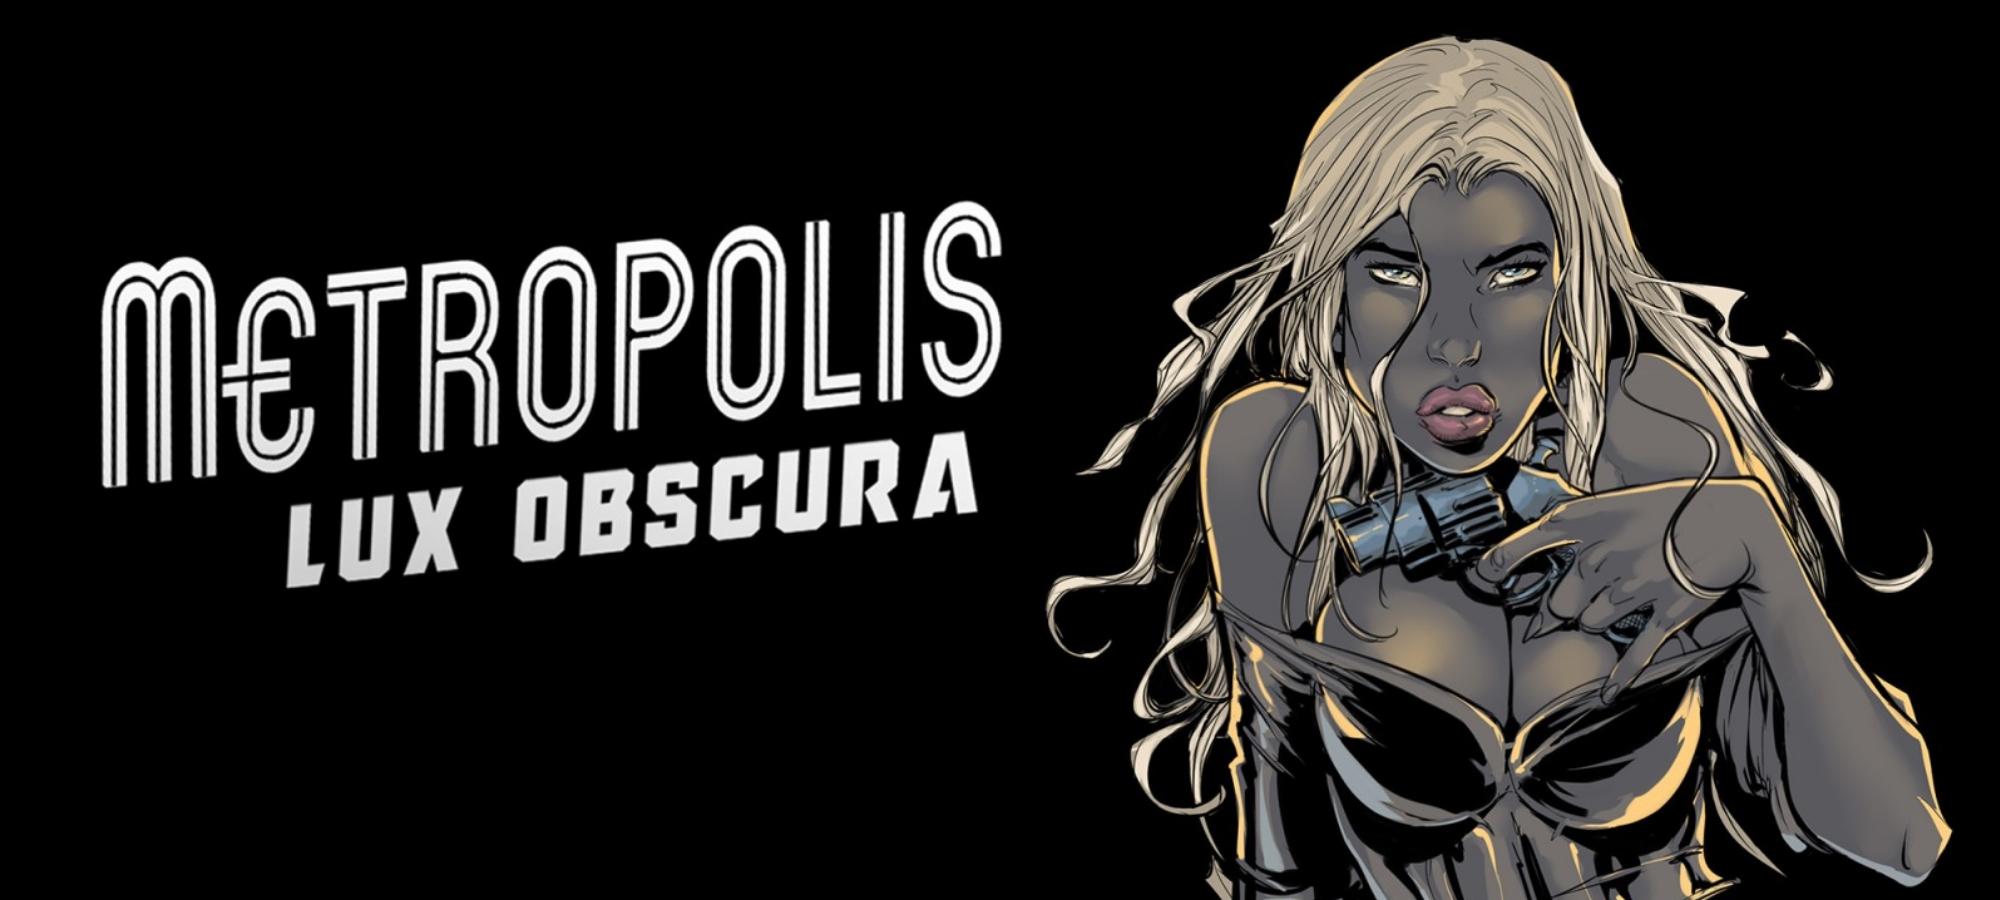 Обзор Metropolis: Lux Obscura (18+)